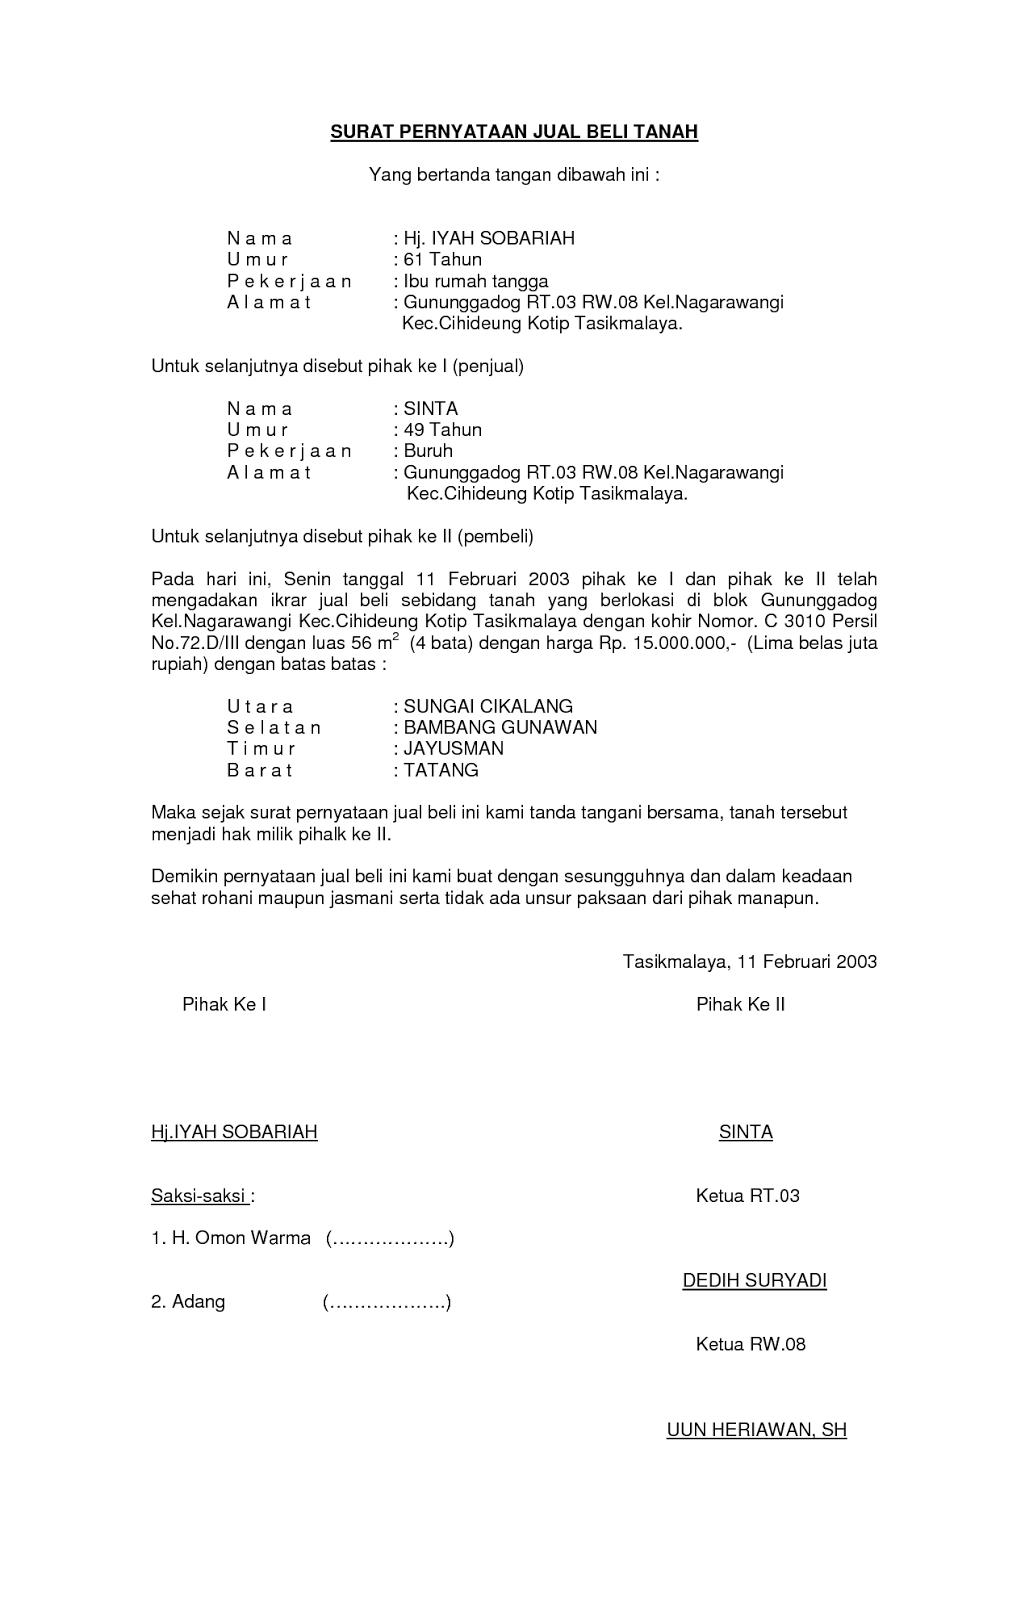 Contoh Surat Pernyataan Minat - Contoh O